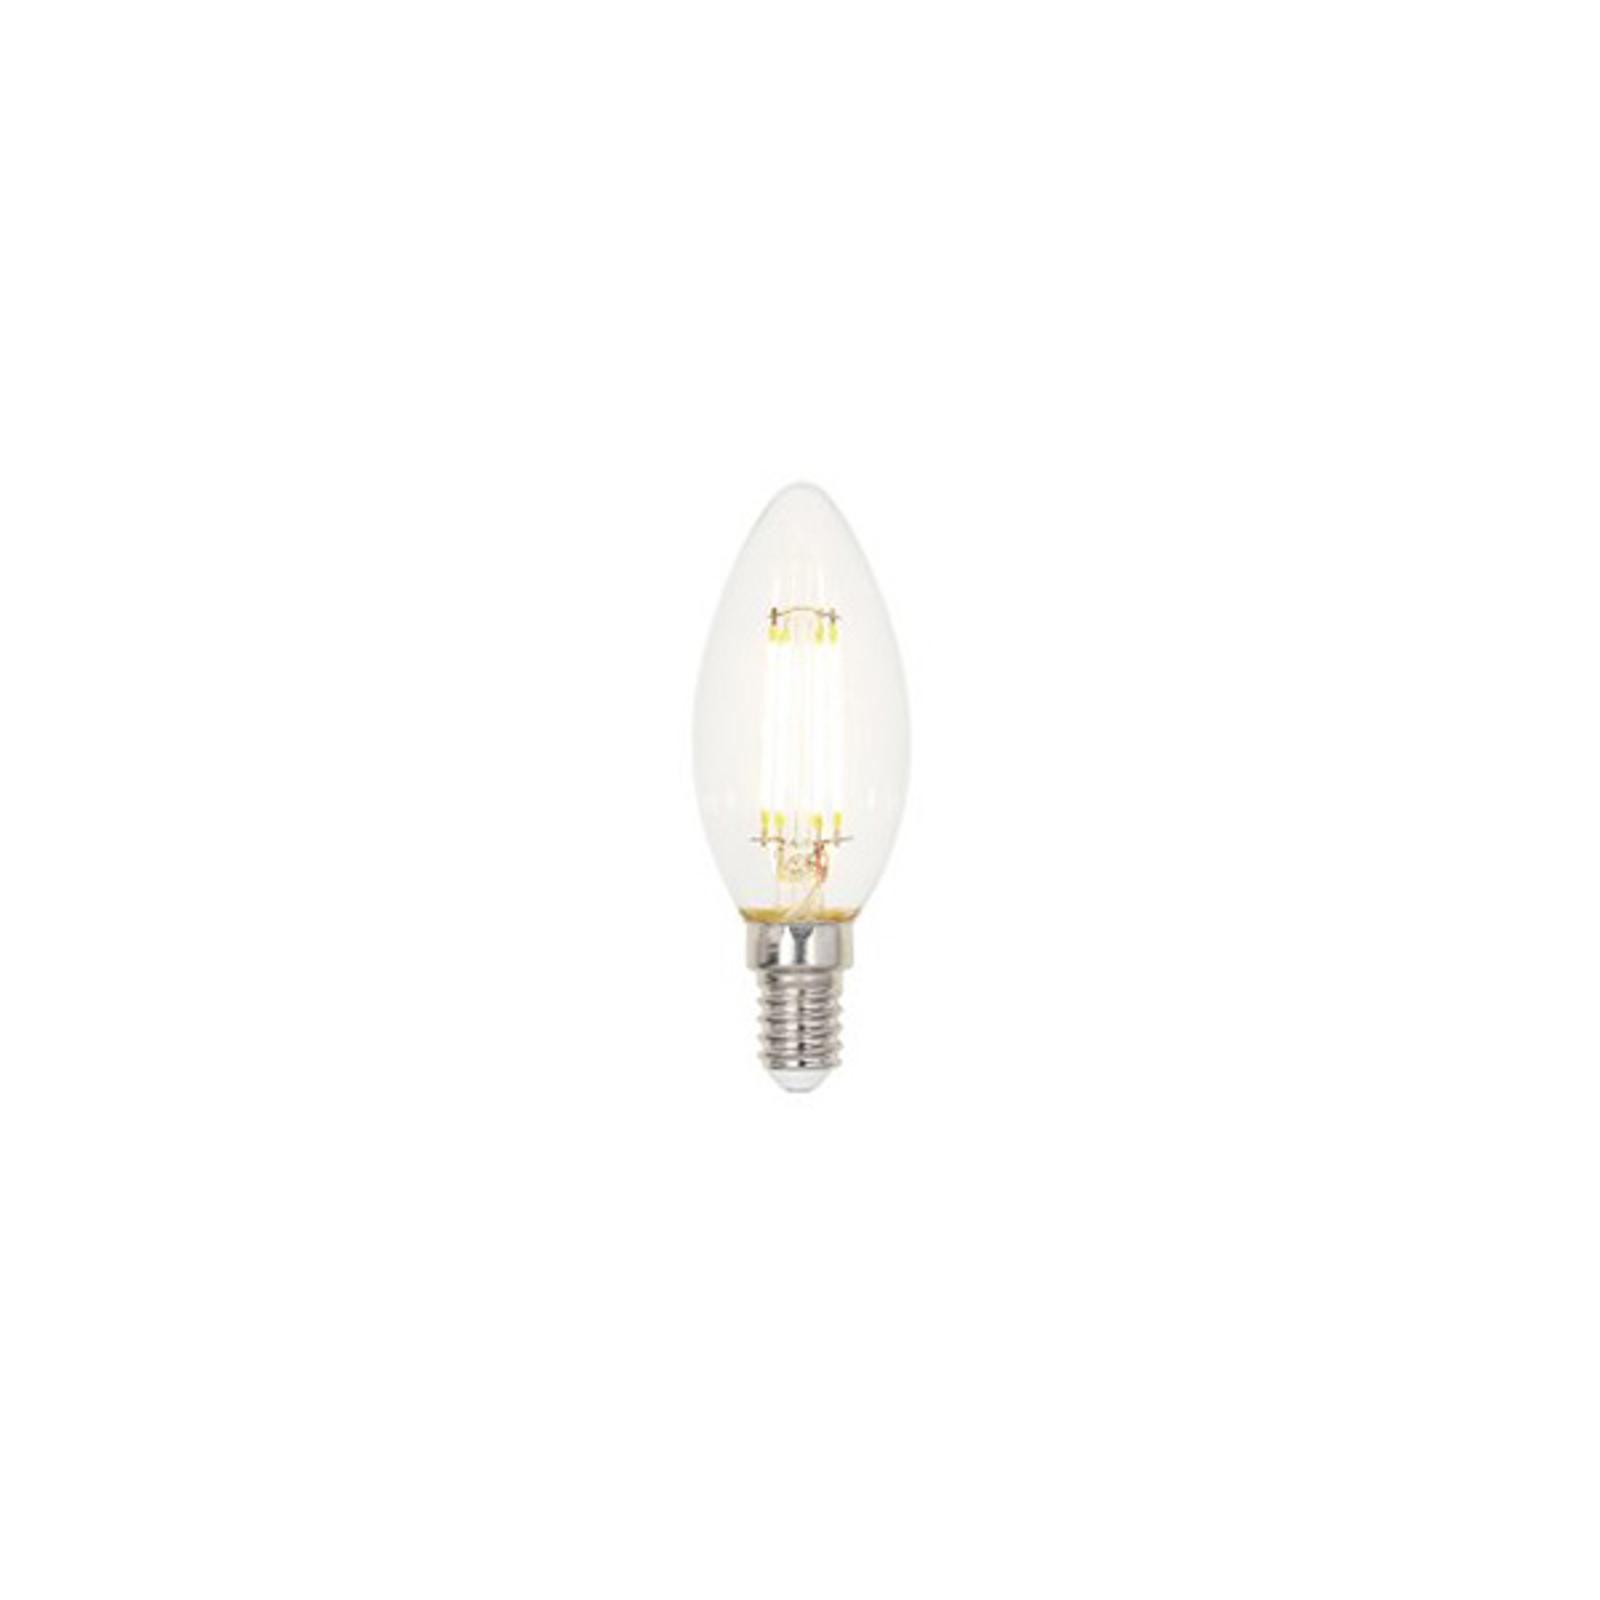 Westinghouse LED-lampa E14 4,5W 2700 K dimbar